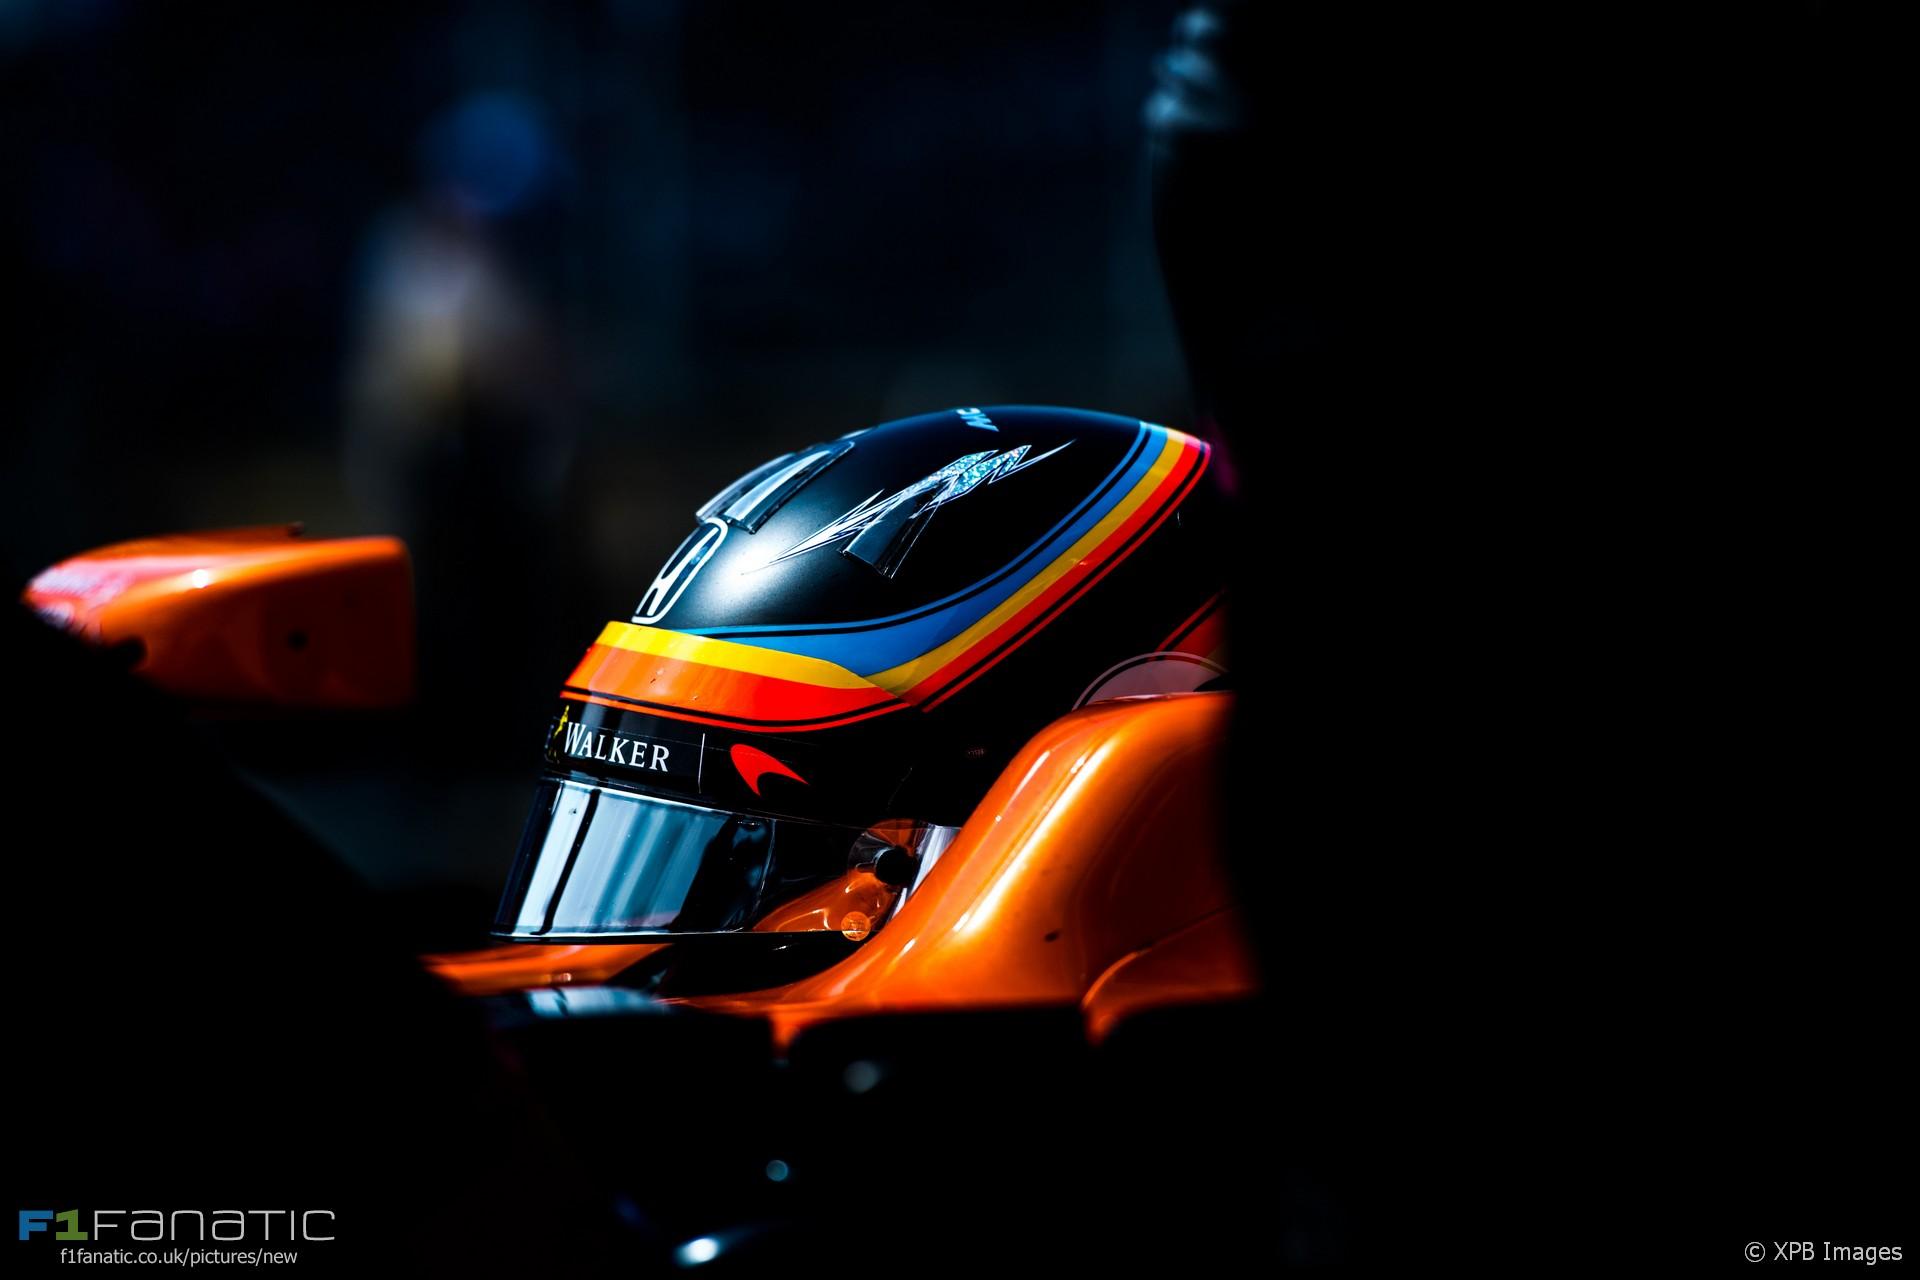 Fernando Alonso, McLaren, Circuit of the Americas, 2017